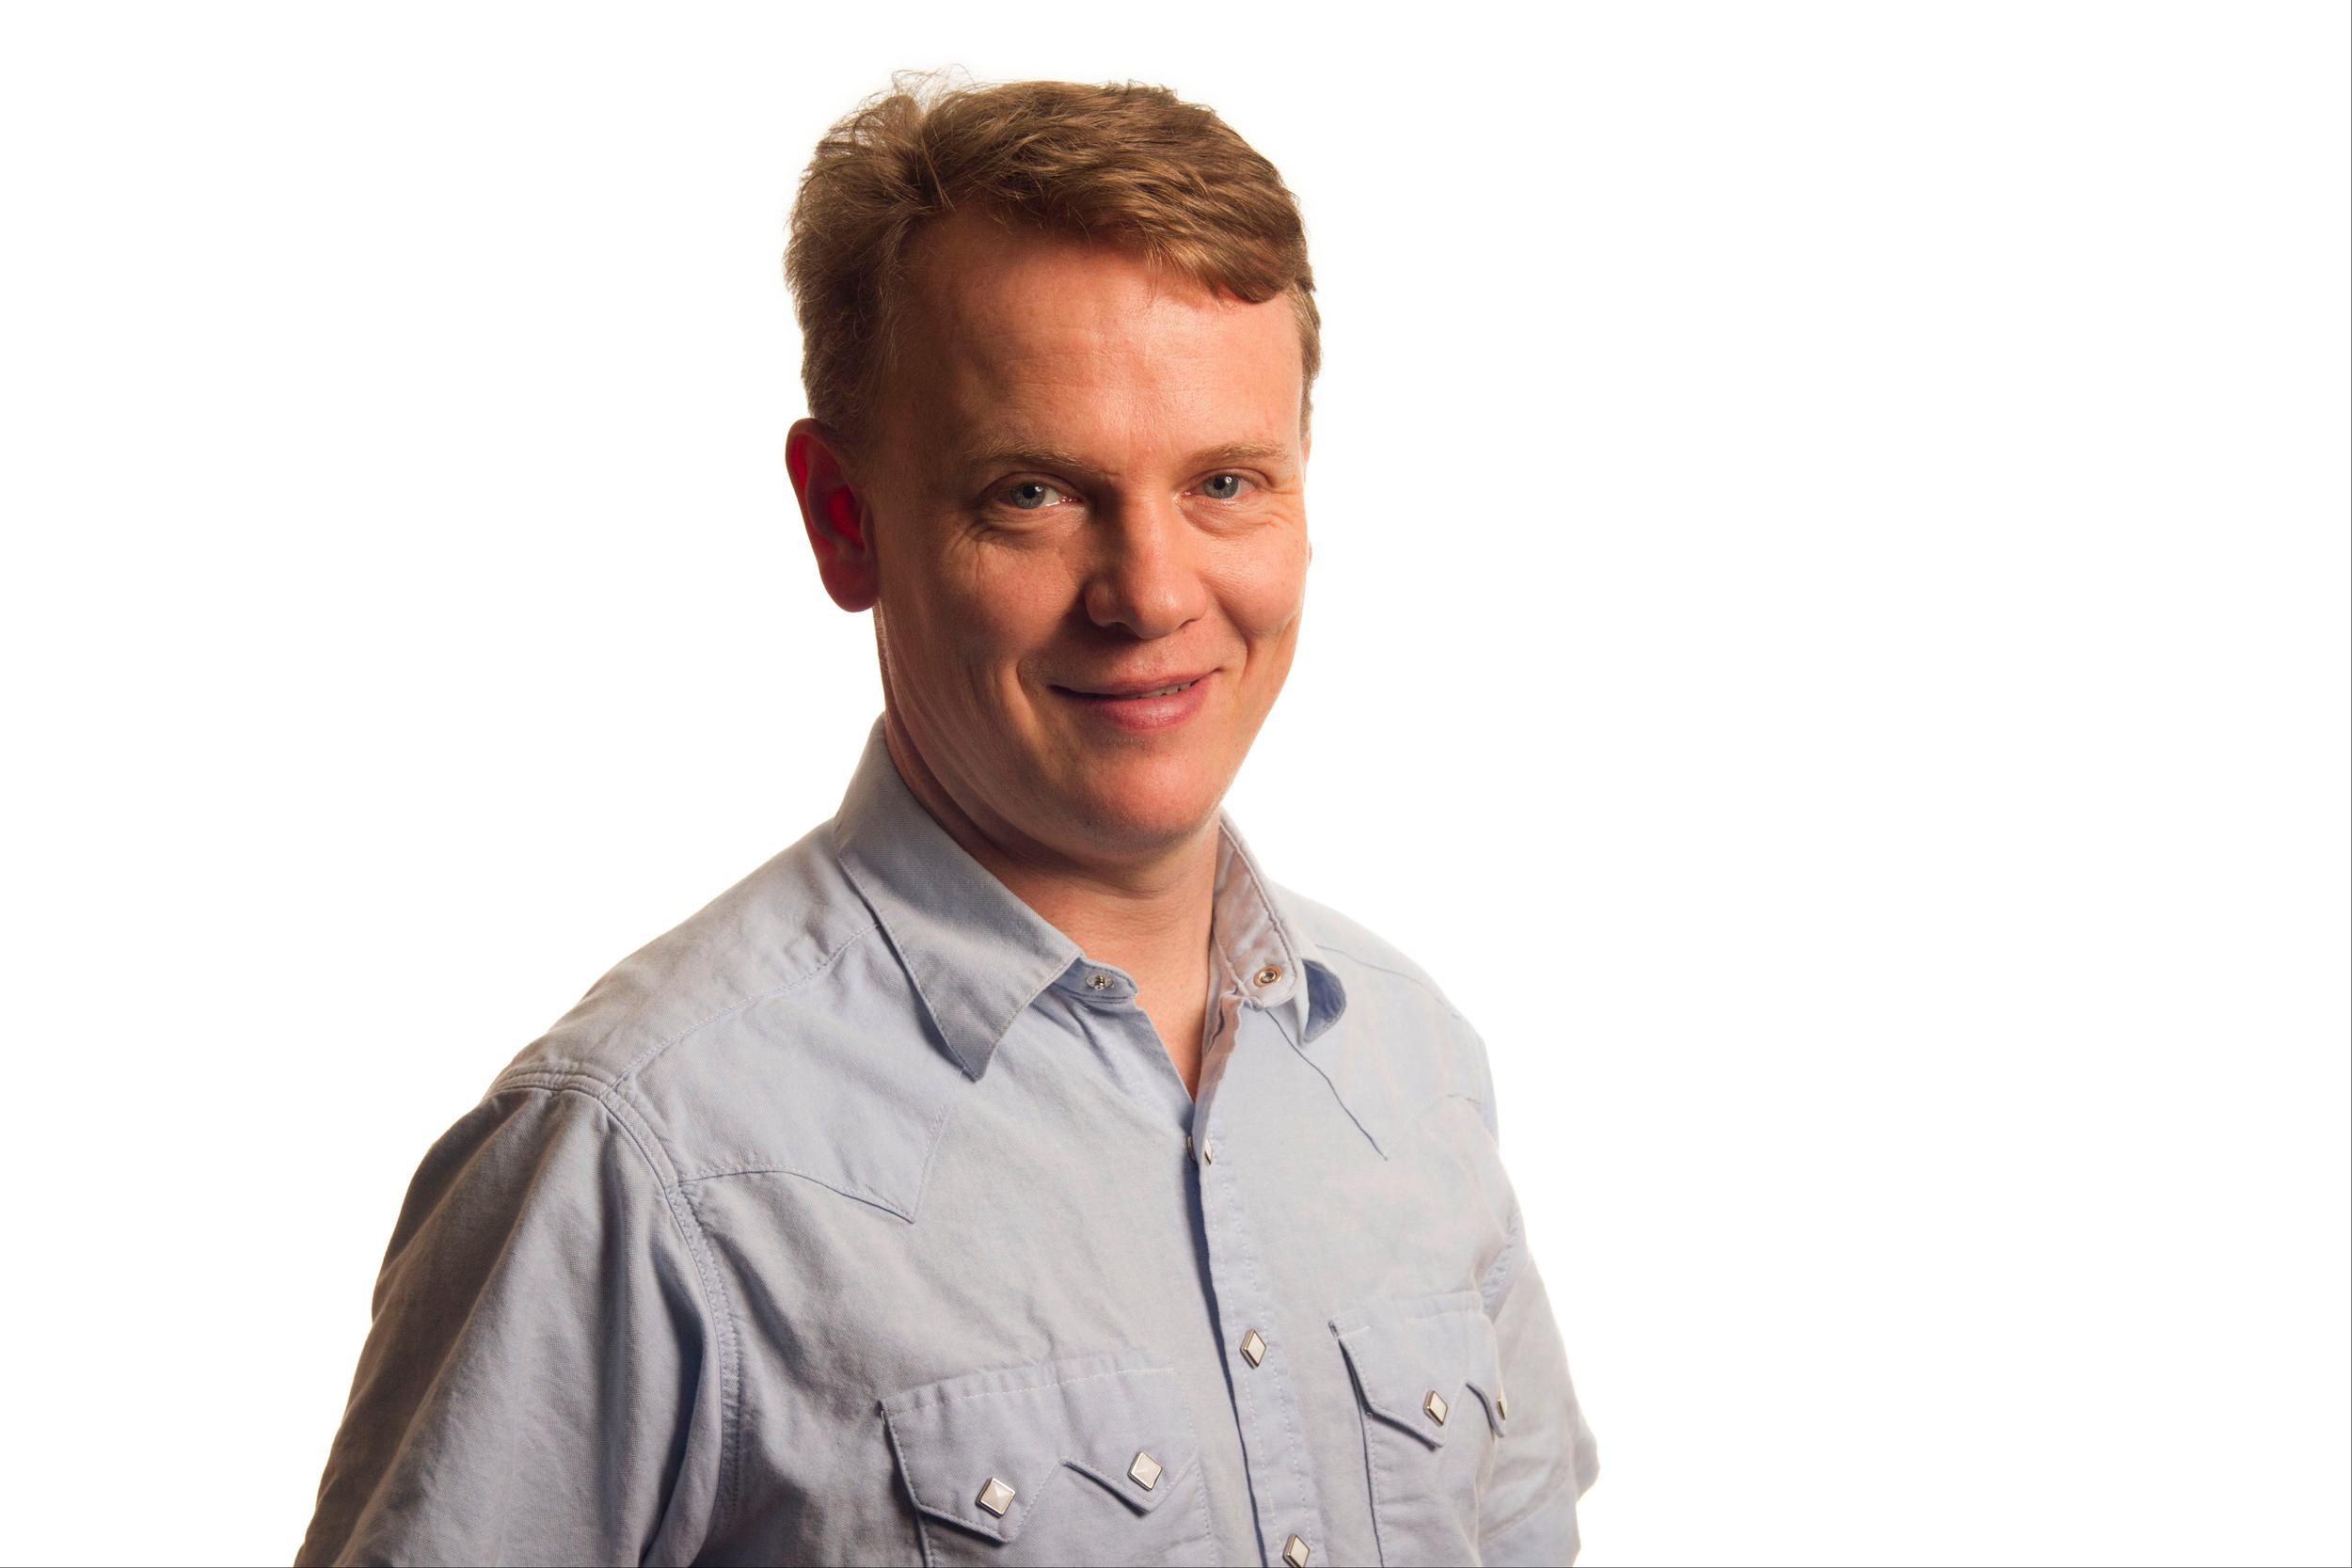 Wes Pope, workshop co-director